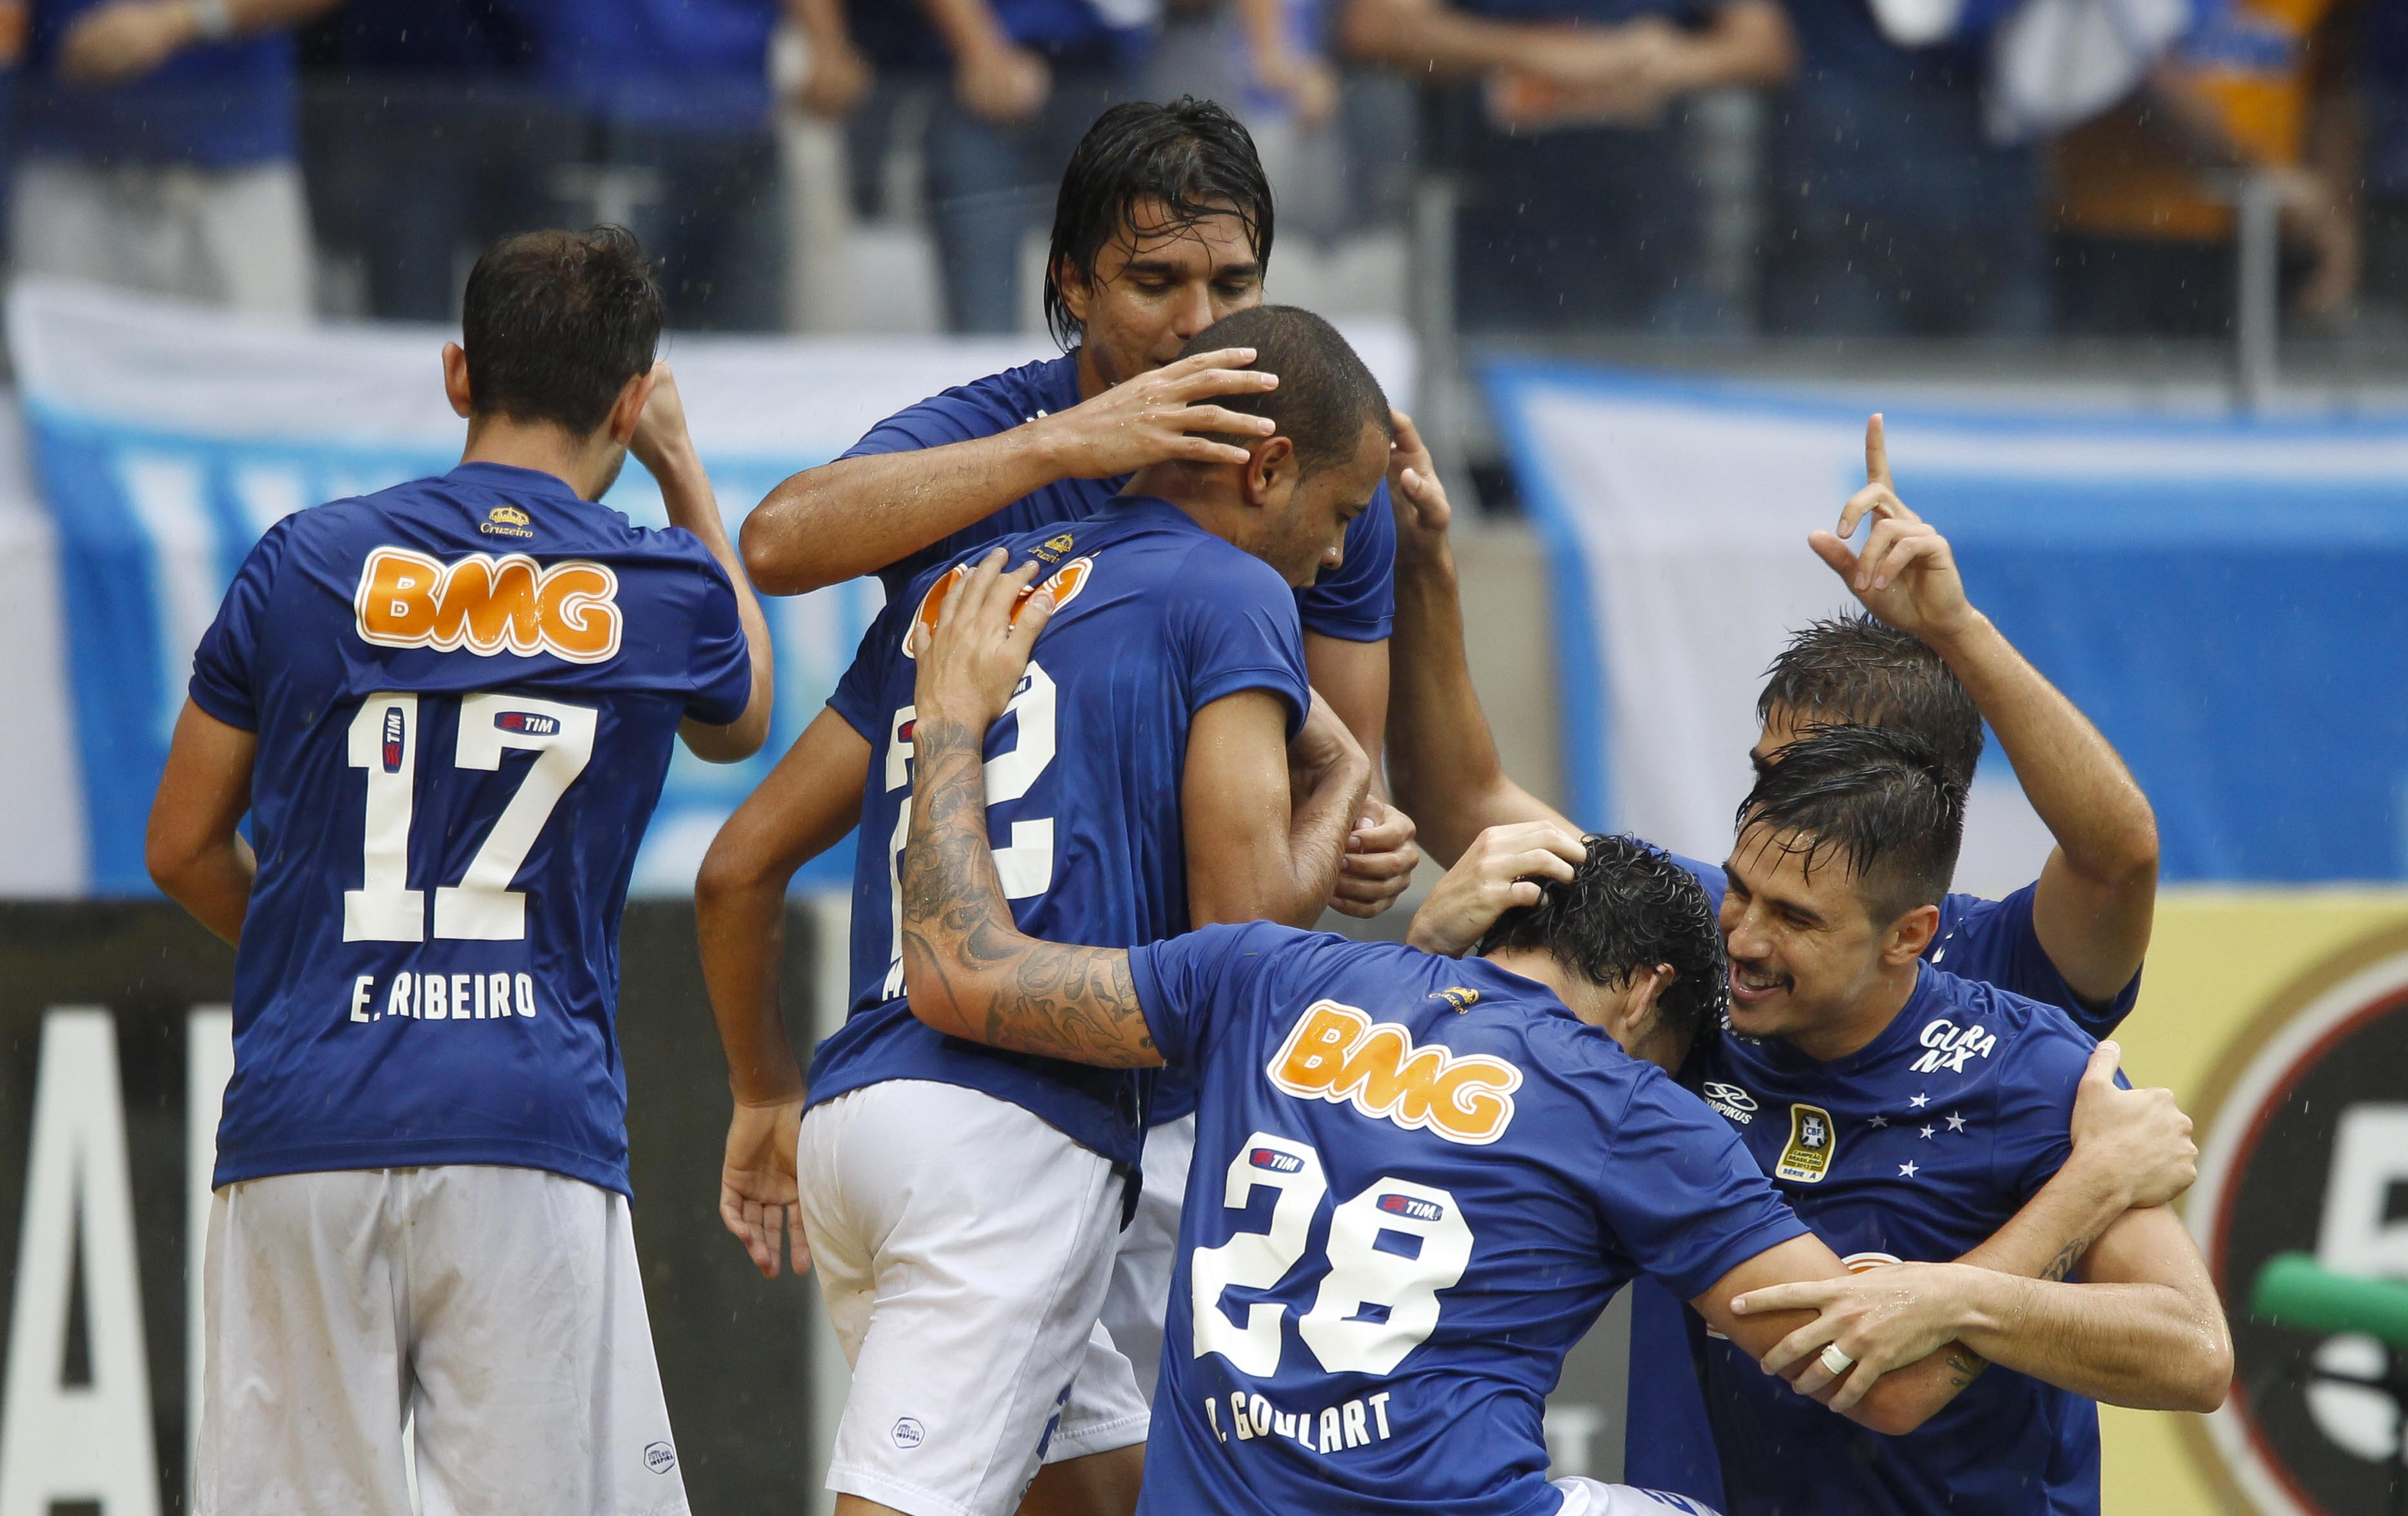 Reveja os momentos marcantes da campanha do título do Cruzeiro ... 3146776237f91